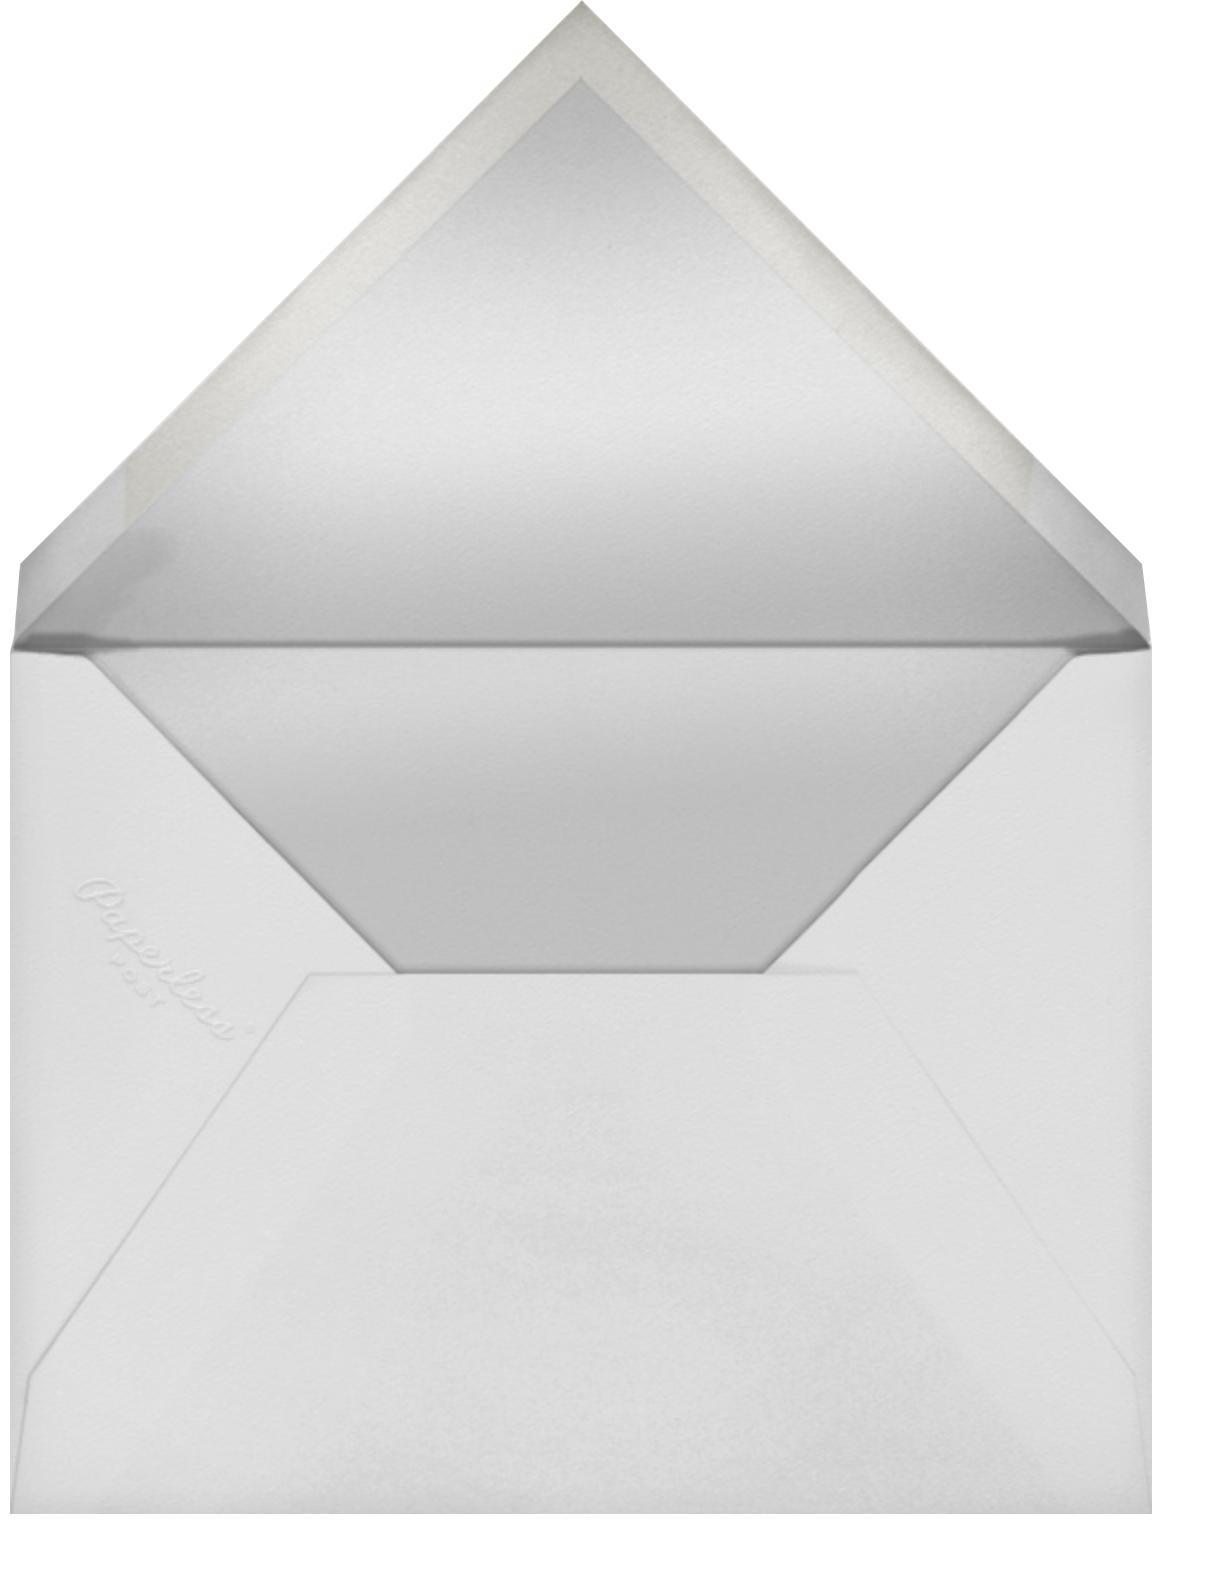 Lamina II (Program) - Charcoal - Paperless Post - Menus and programs - envelope back